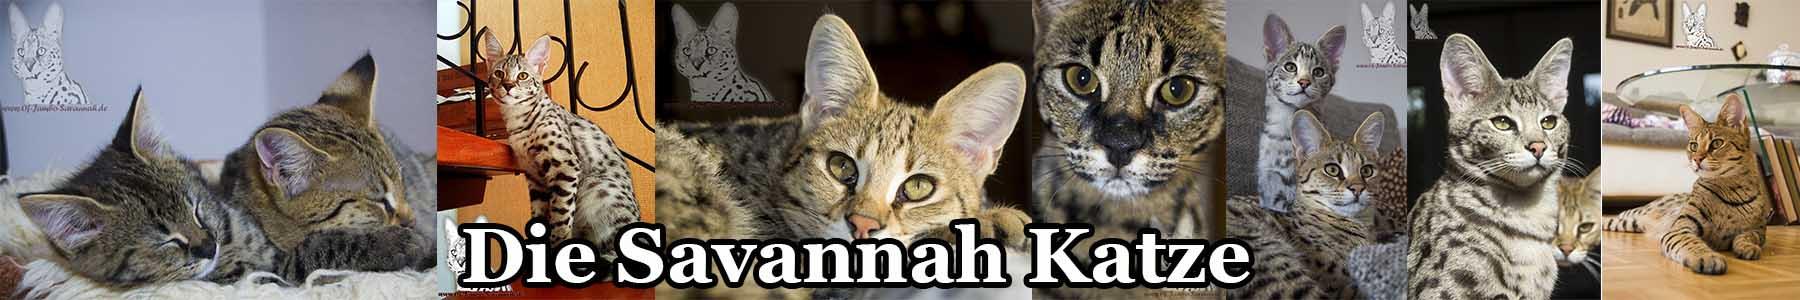 savannah katze of jambo savannah cats. Black Bedroom Furniture Sets. Home Design Ideas